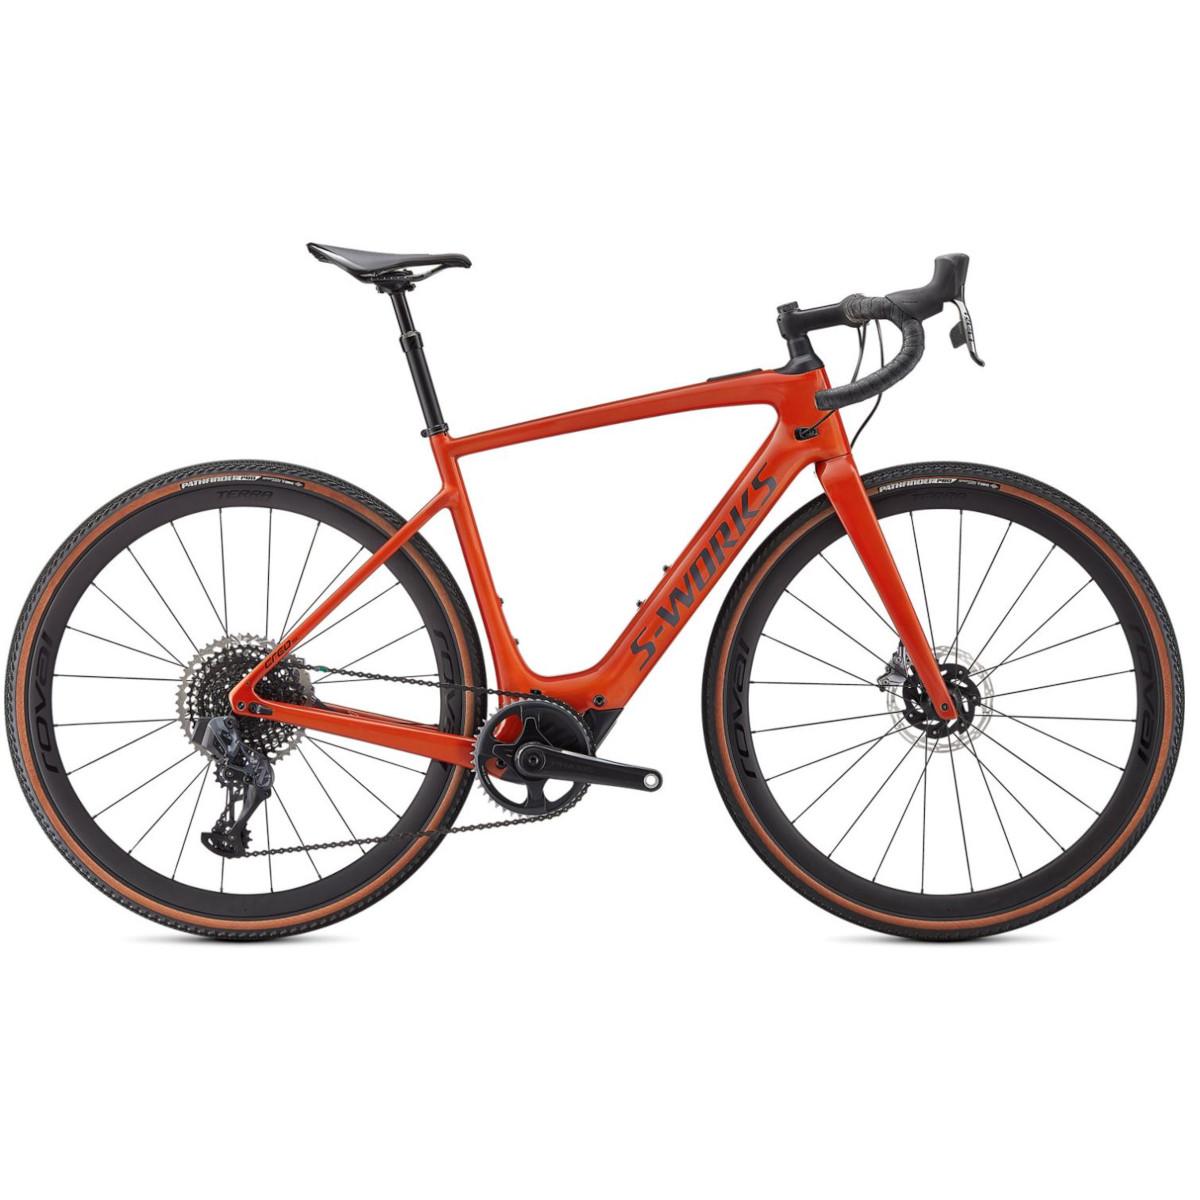 Produktbild von Specialized S-WORKS TURBO CREO SL EVO - Carbon Gravel E-Bike - 2021 - redwood / carbon